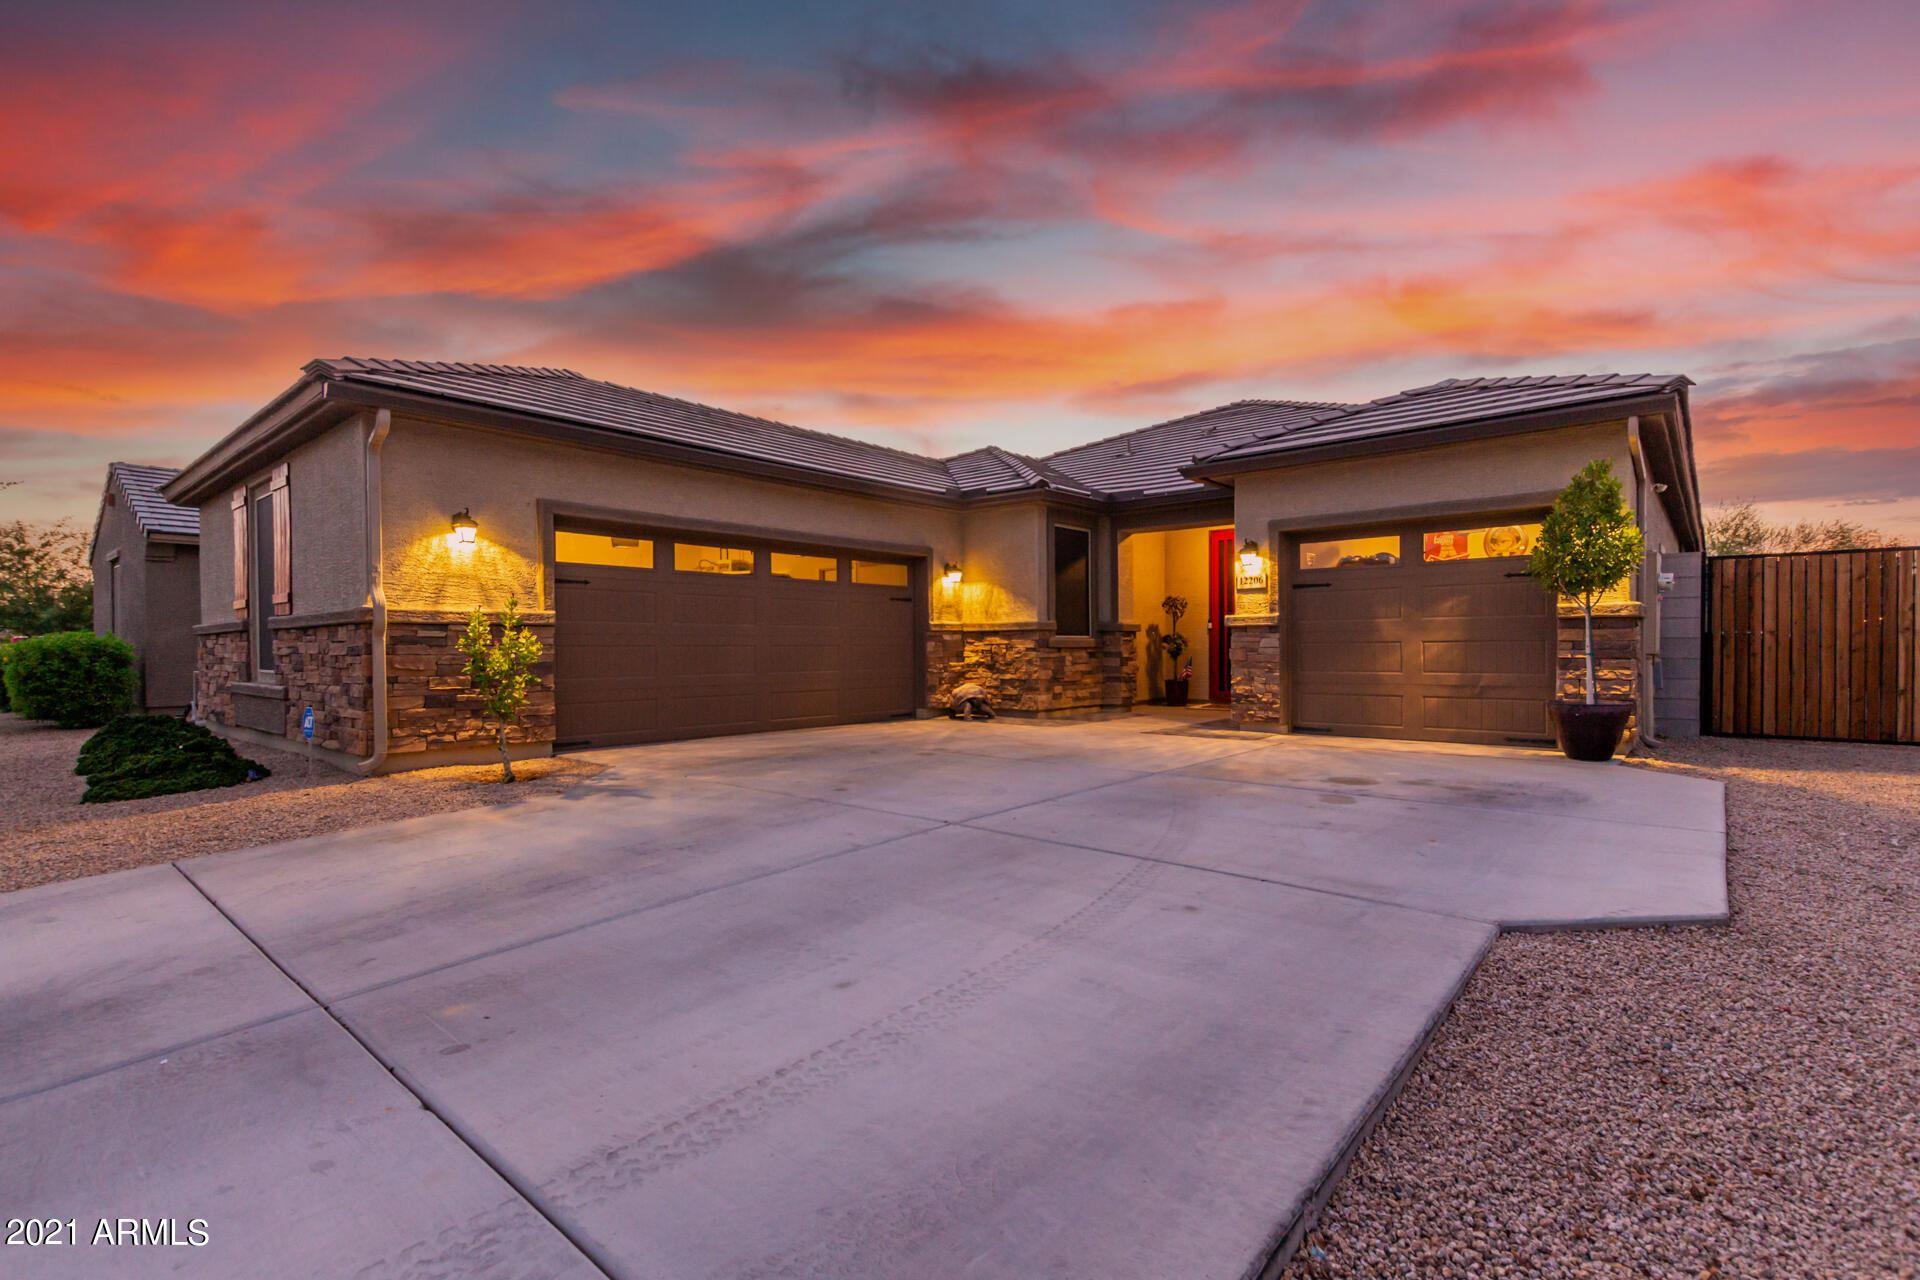 Photo of 12206 W WINSLOW Avenue, Tolleson, AZ 85353 (MLS # 6264395)